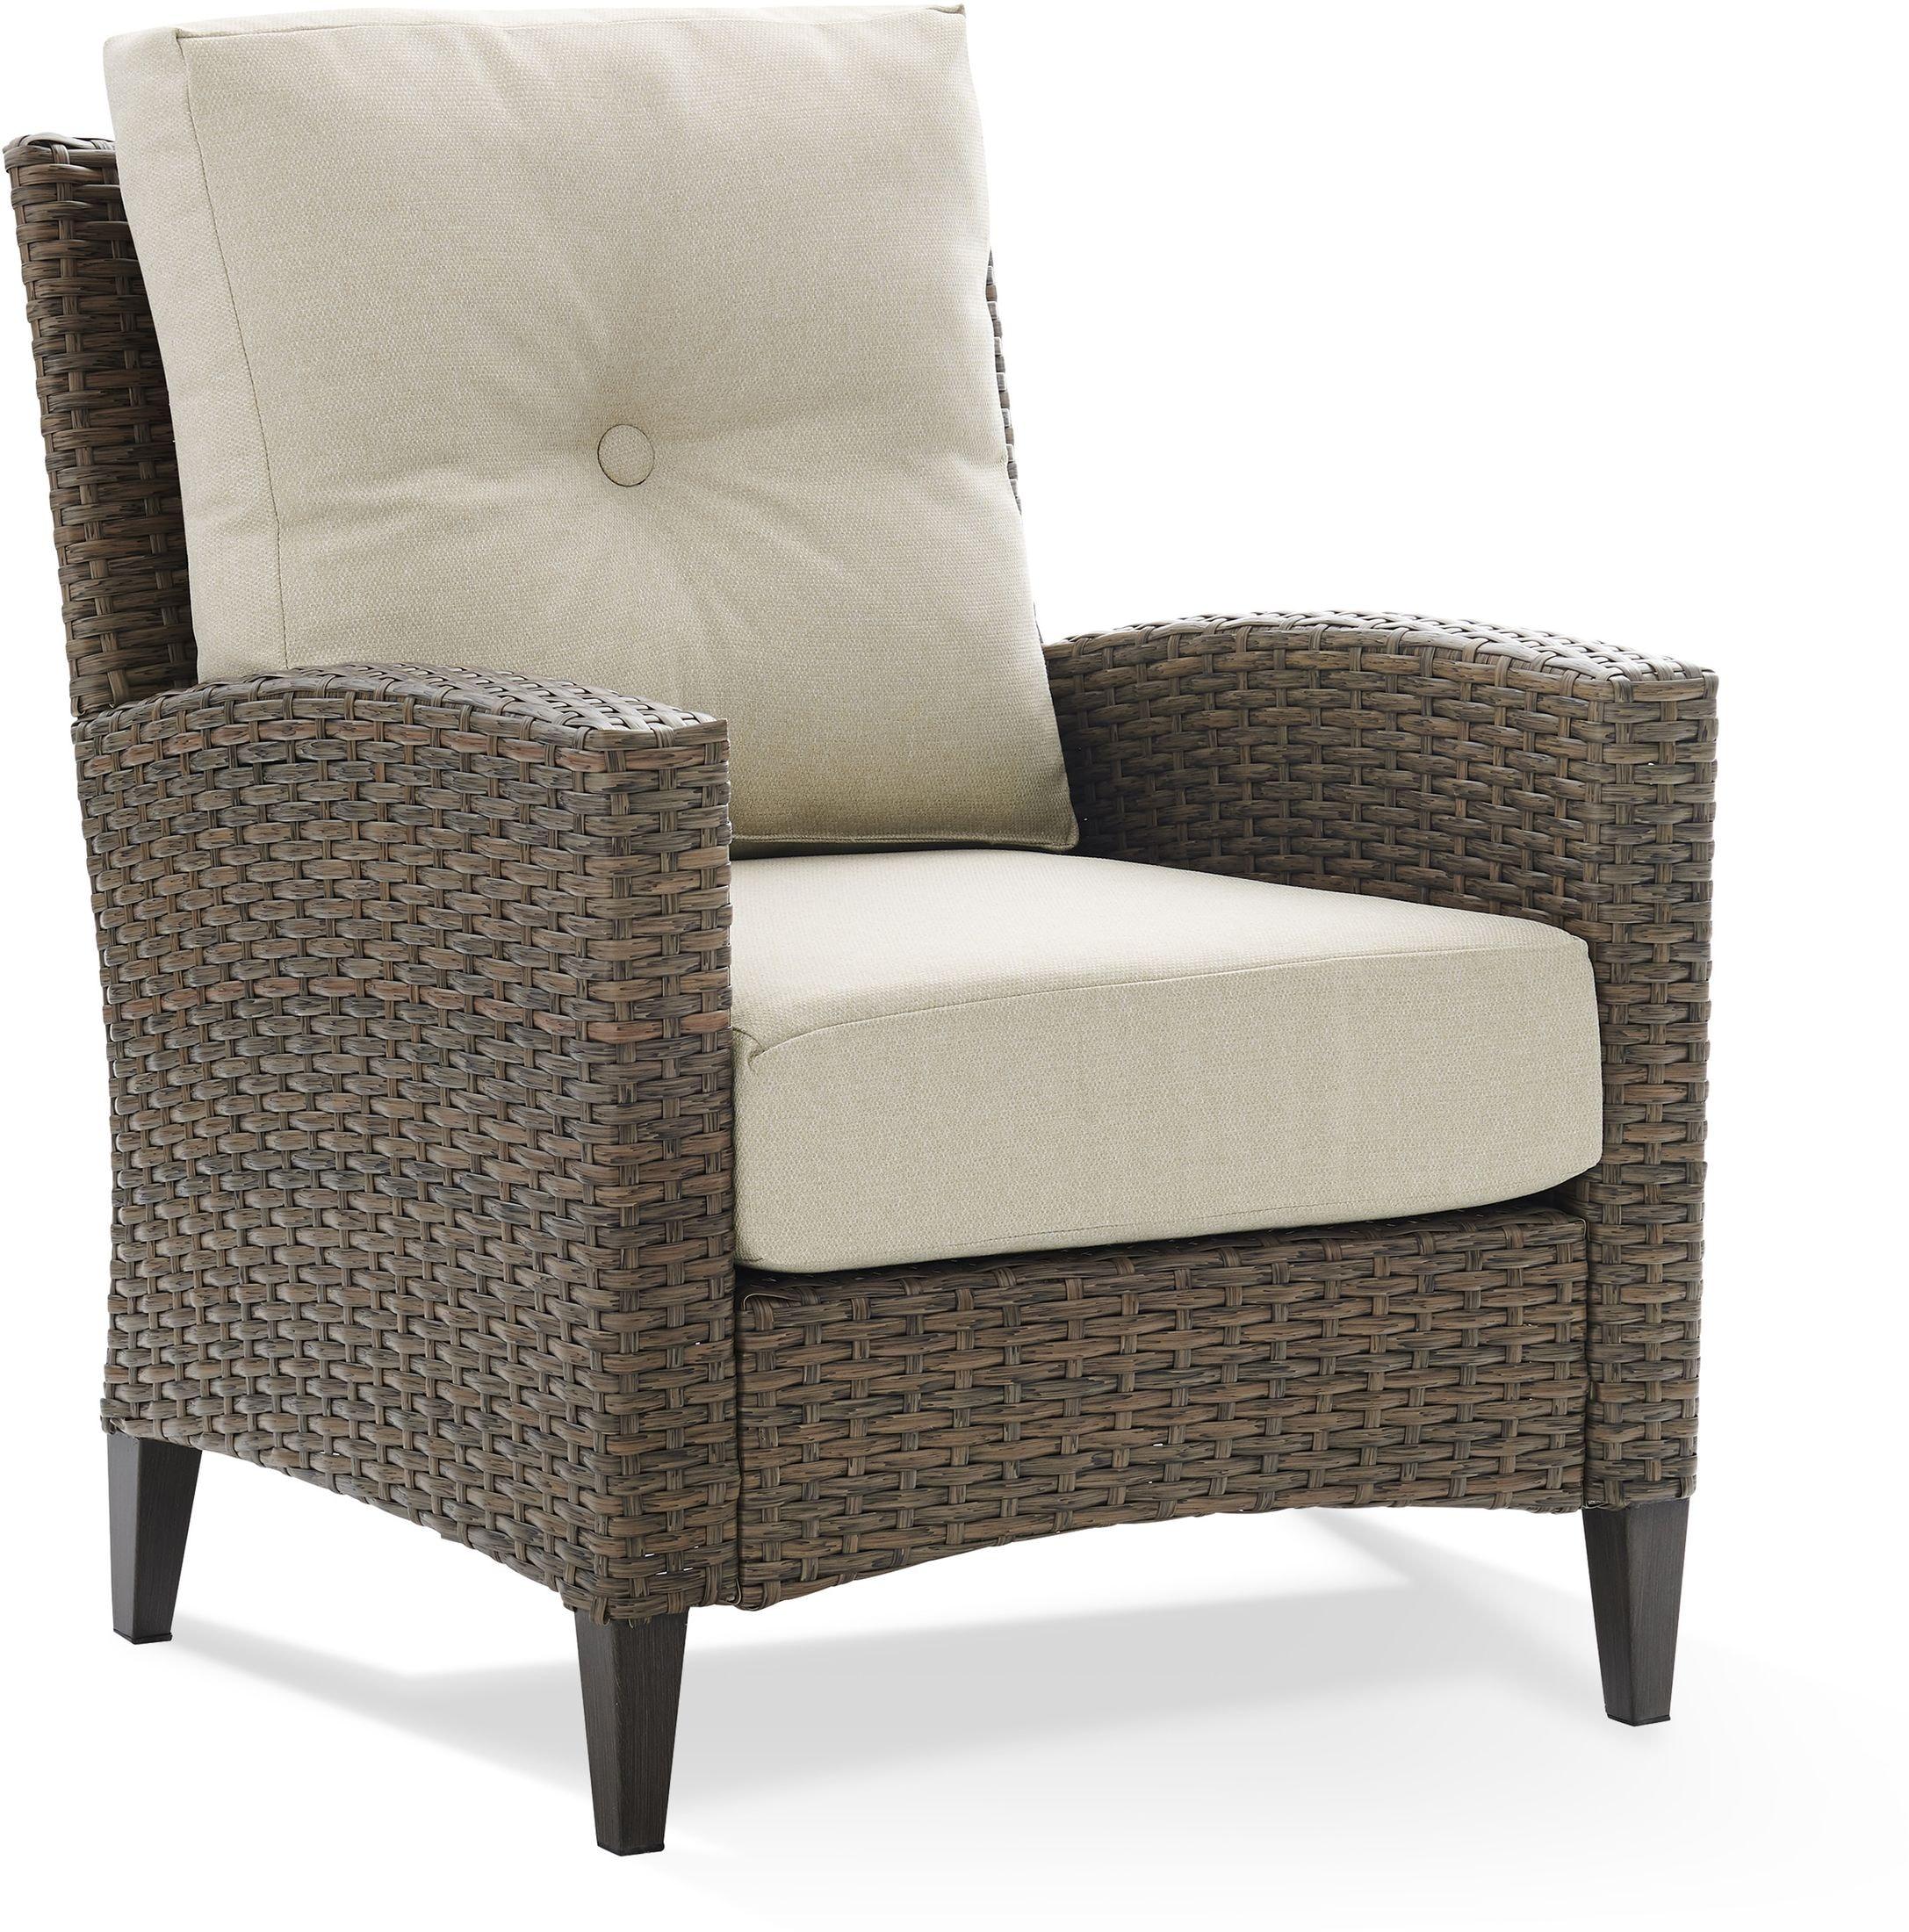 Outdoor Furniture - Huron Outdoor Chair